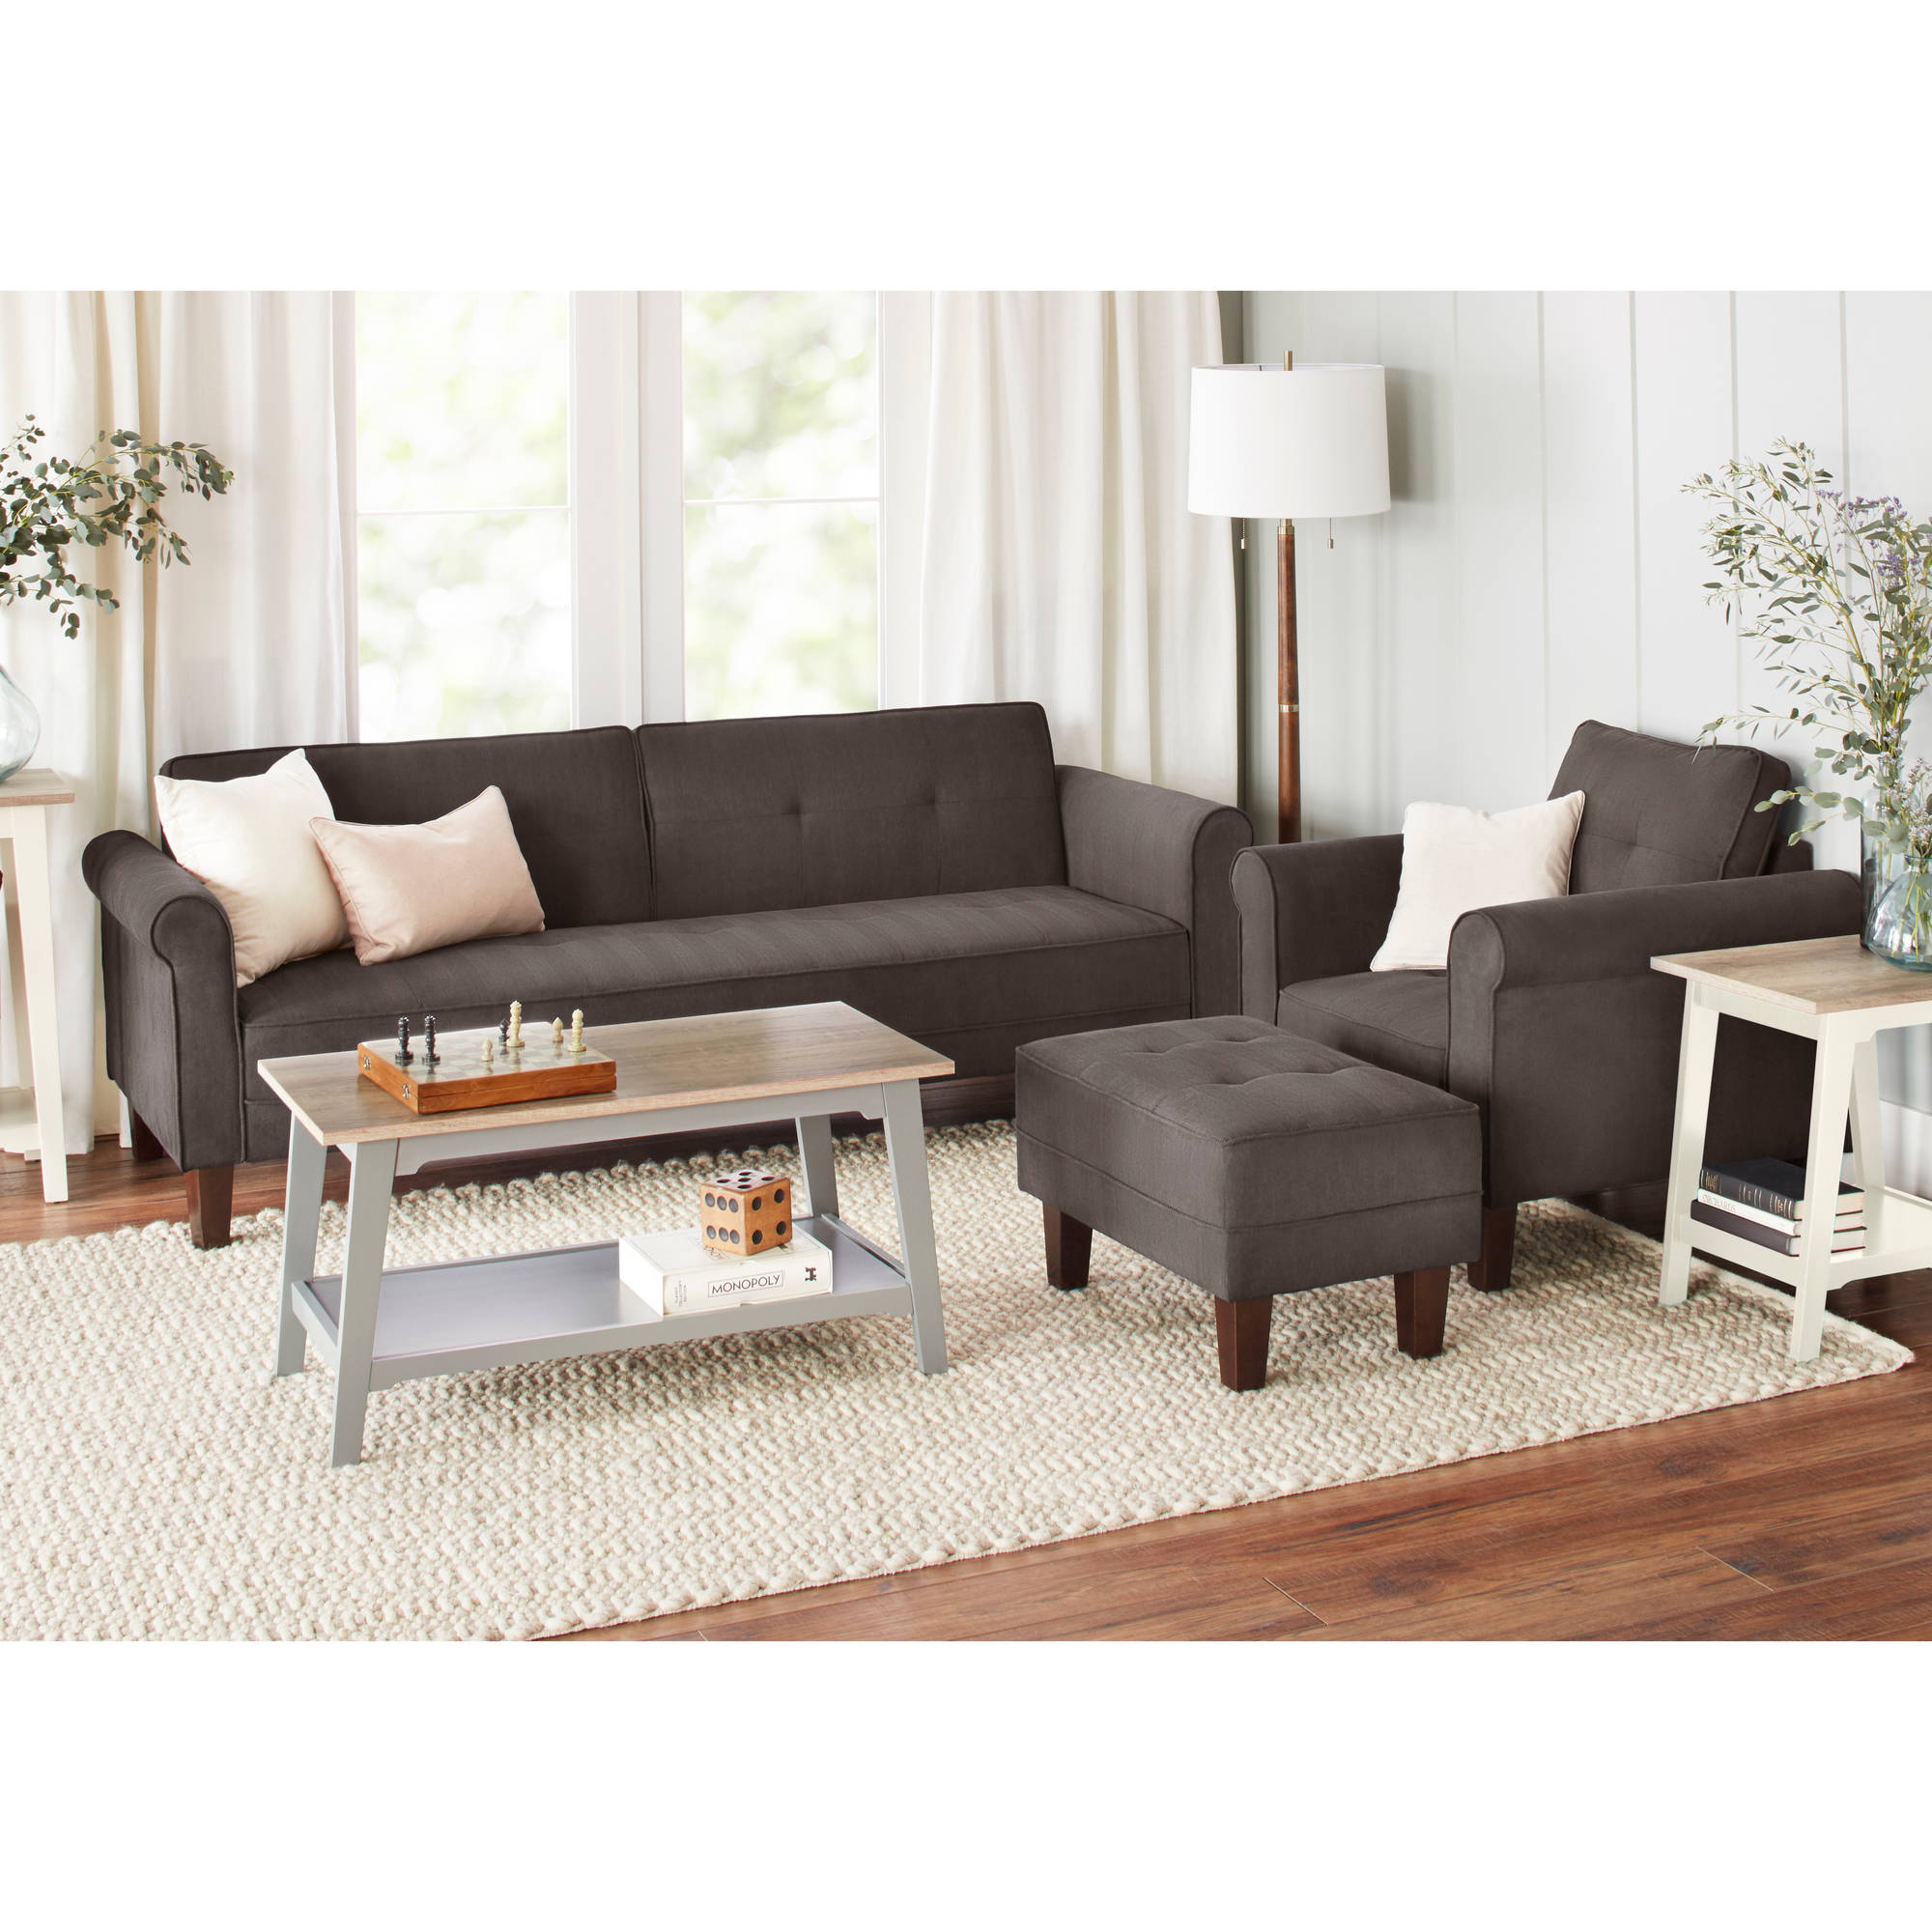 10 Spring Street Ashton Microfiber Sofa Bed Bundle of 5 Walmart